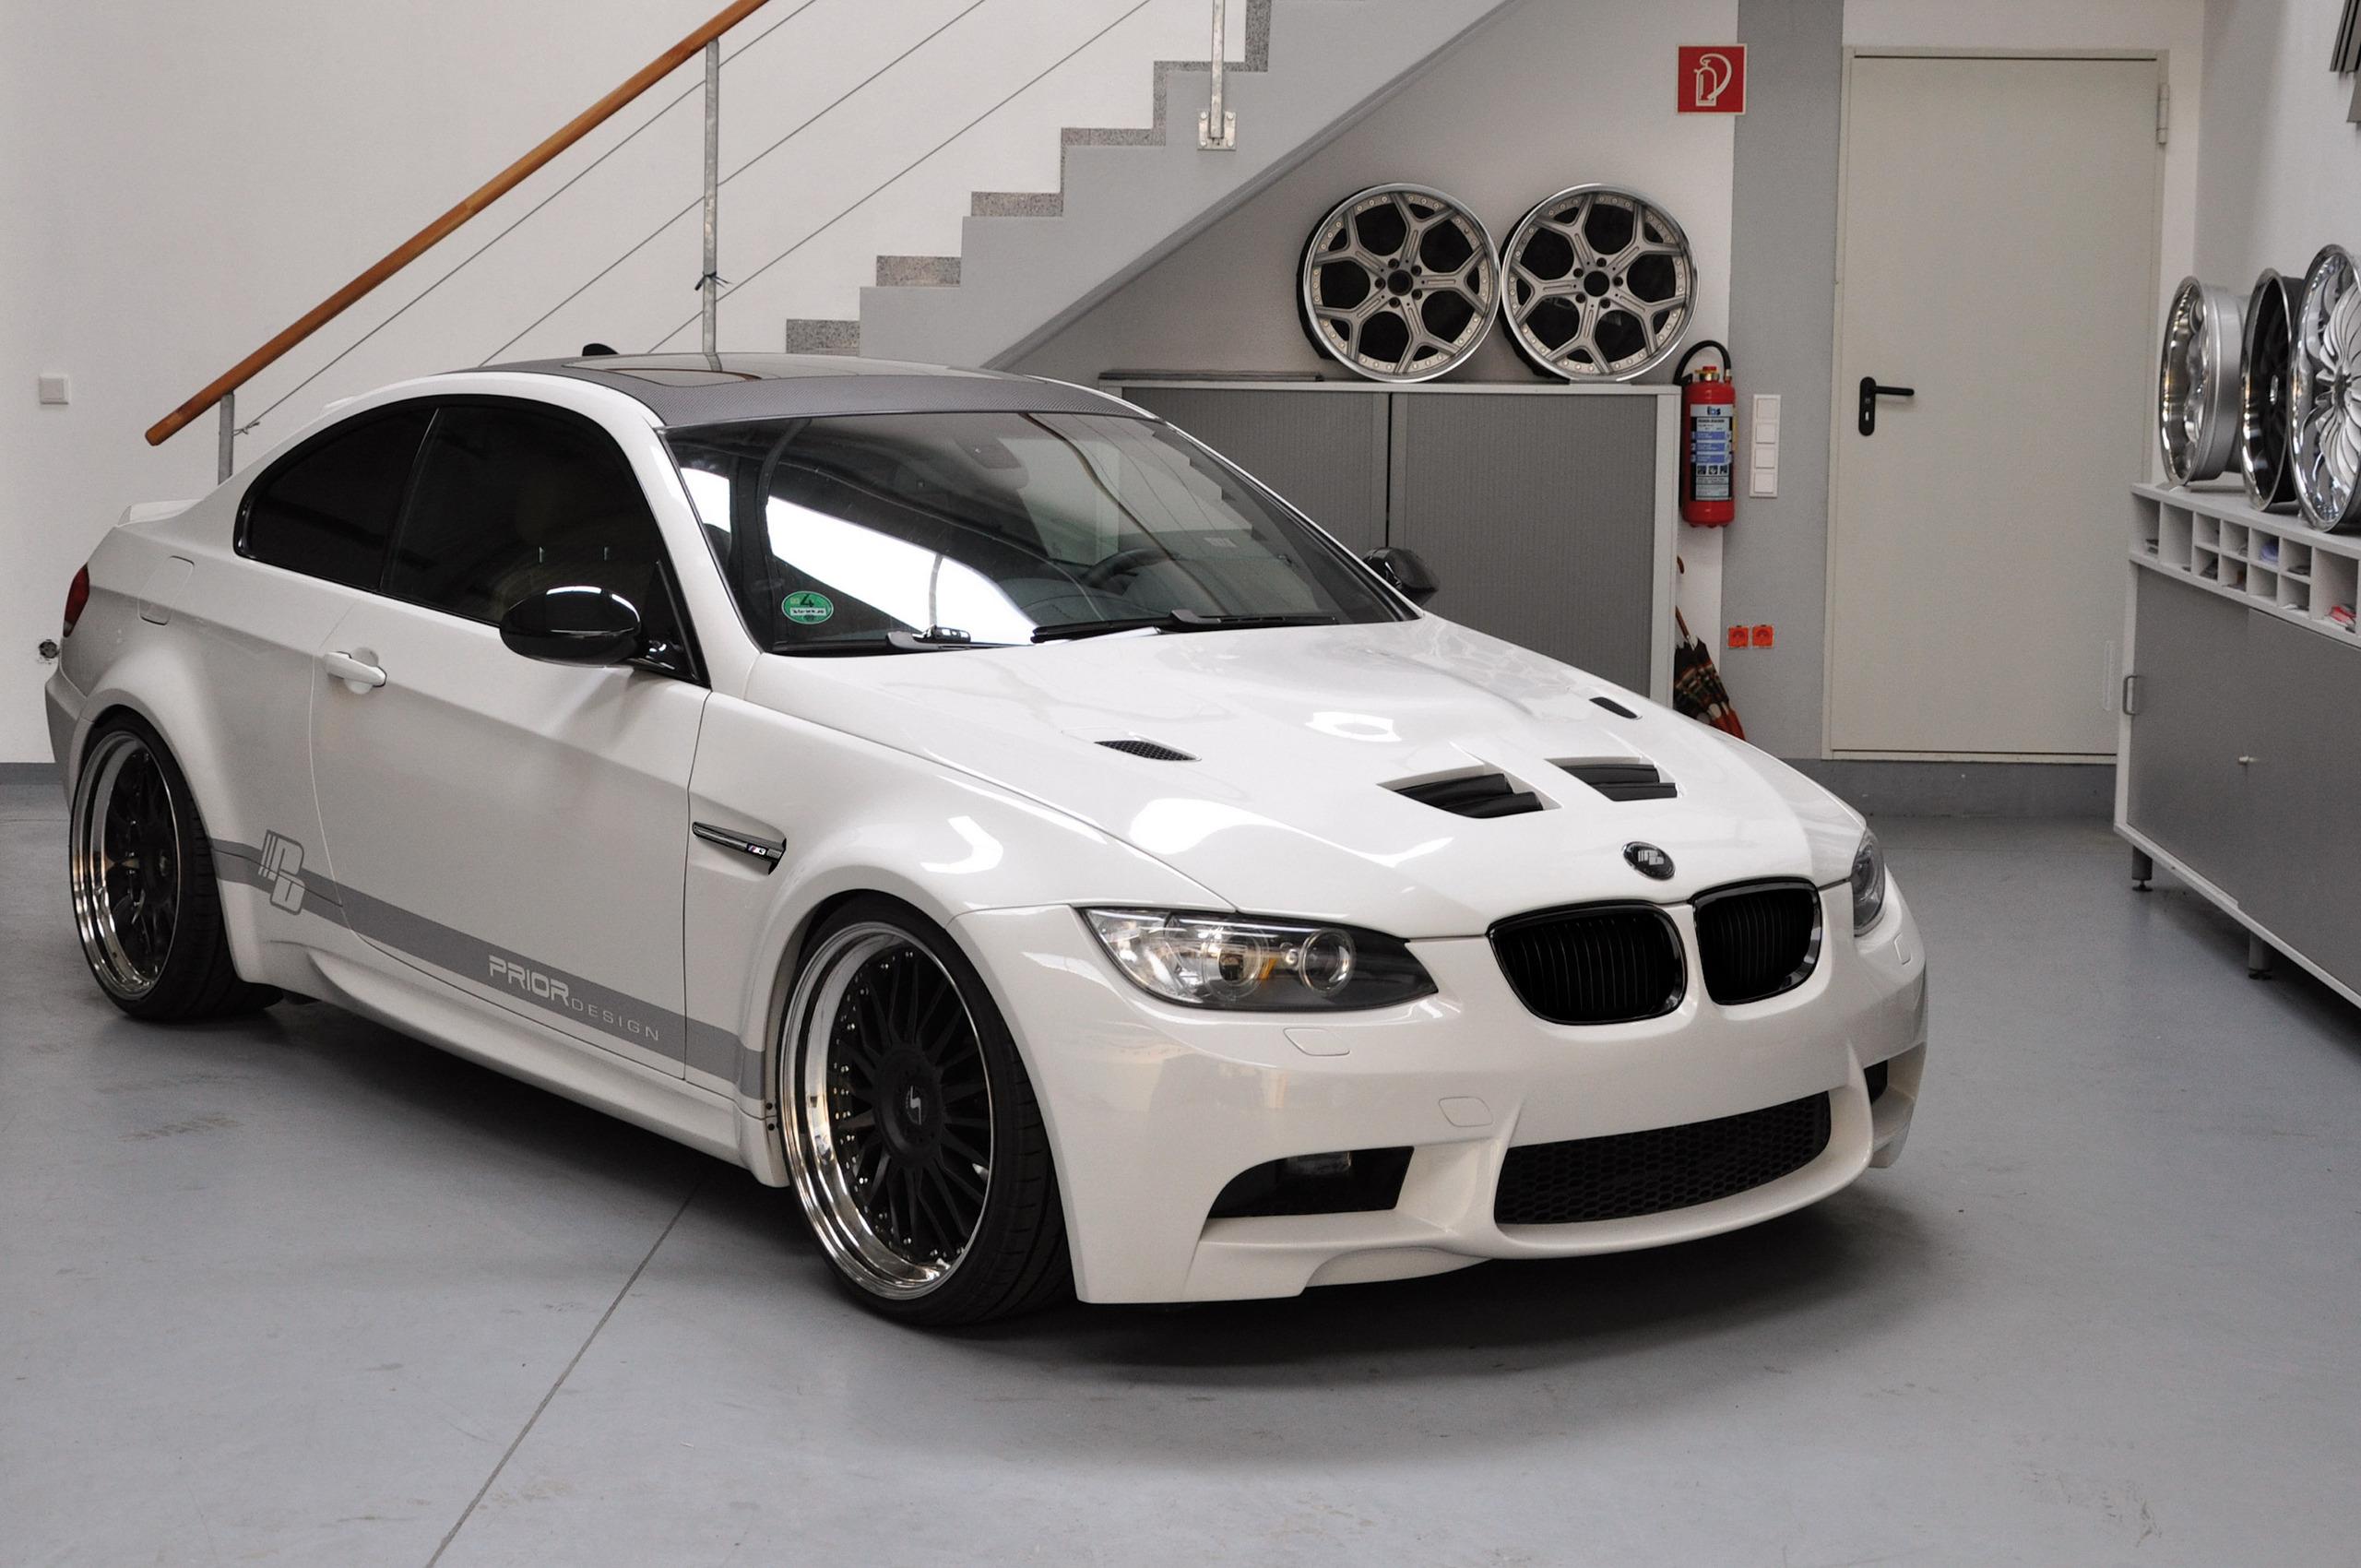 BMW E92 M3 BY PRIOR DESIGN - BMW Photo (26822361) - Fanpop